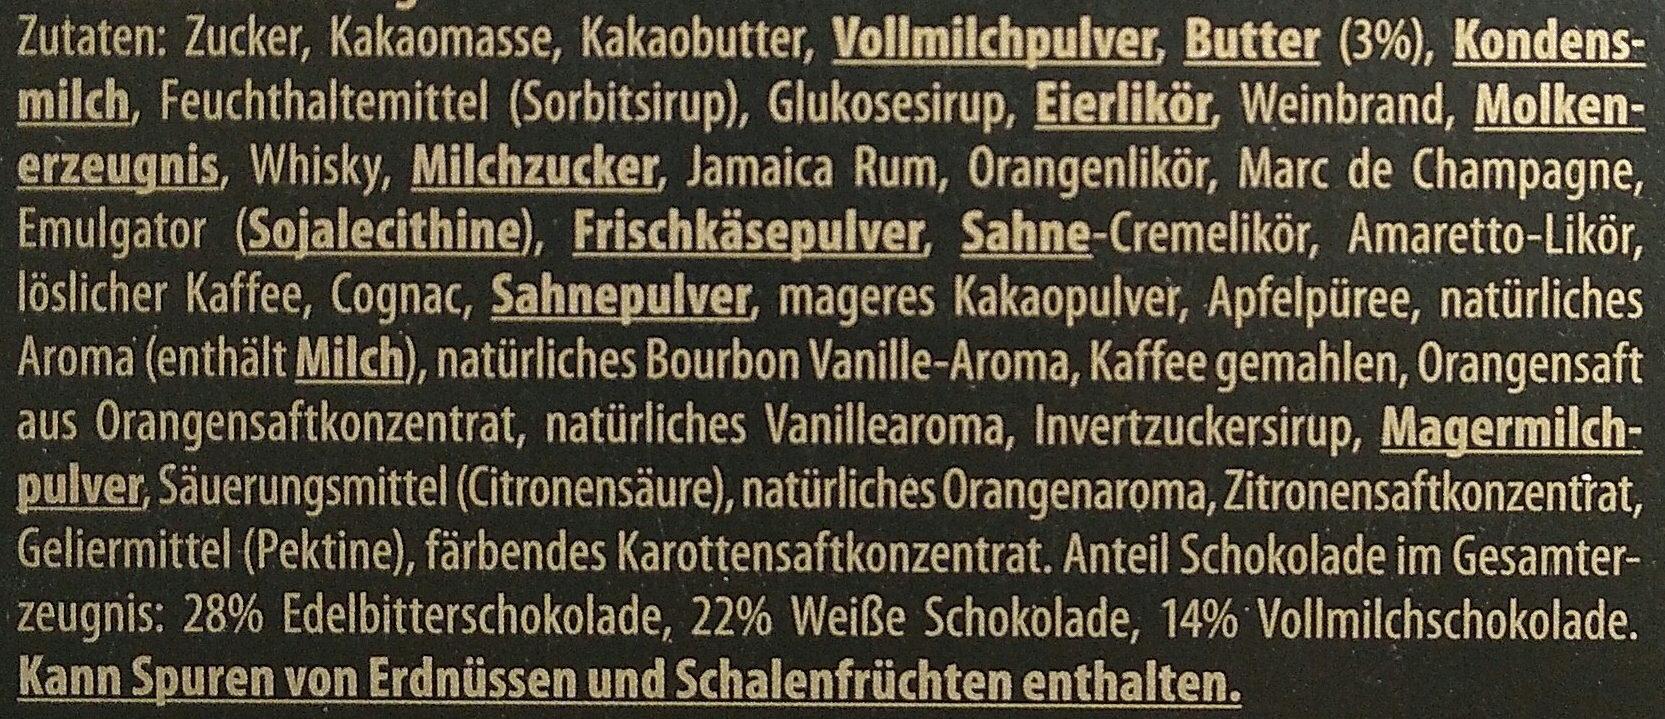 Götterfunken - Ingredients